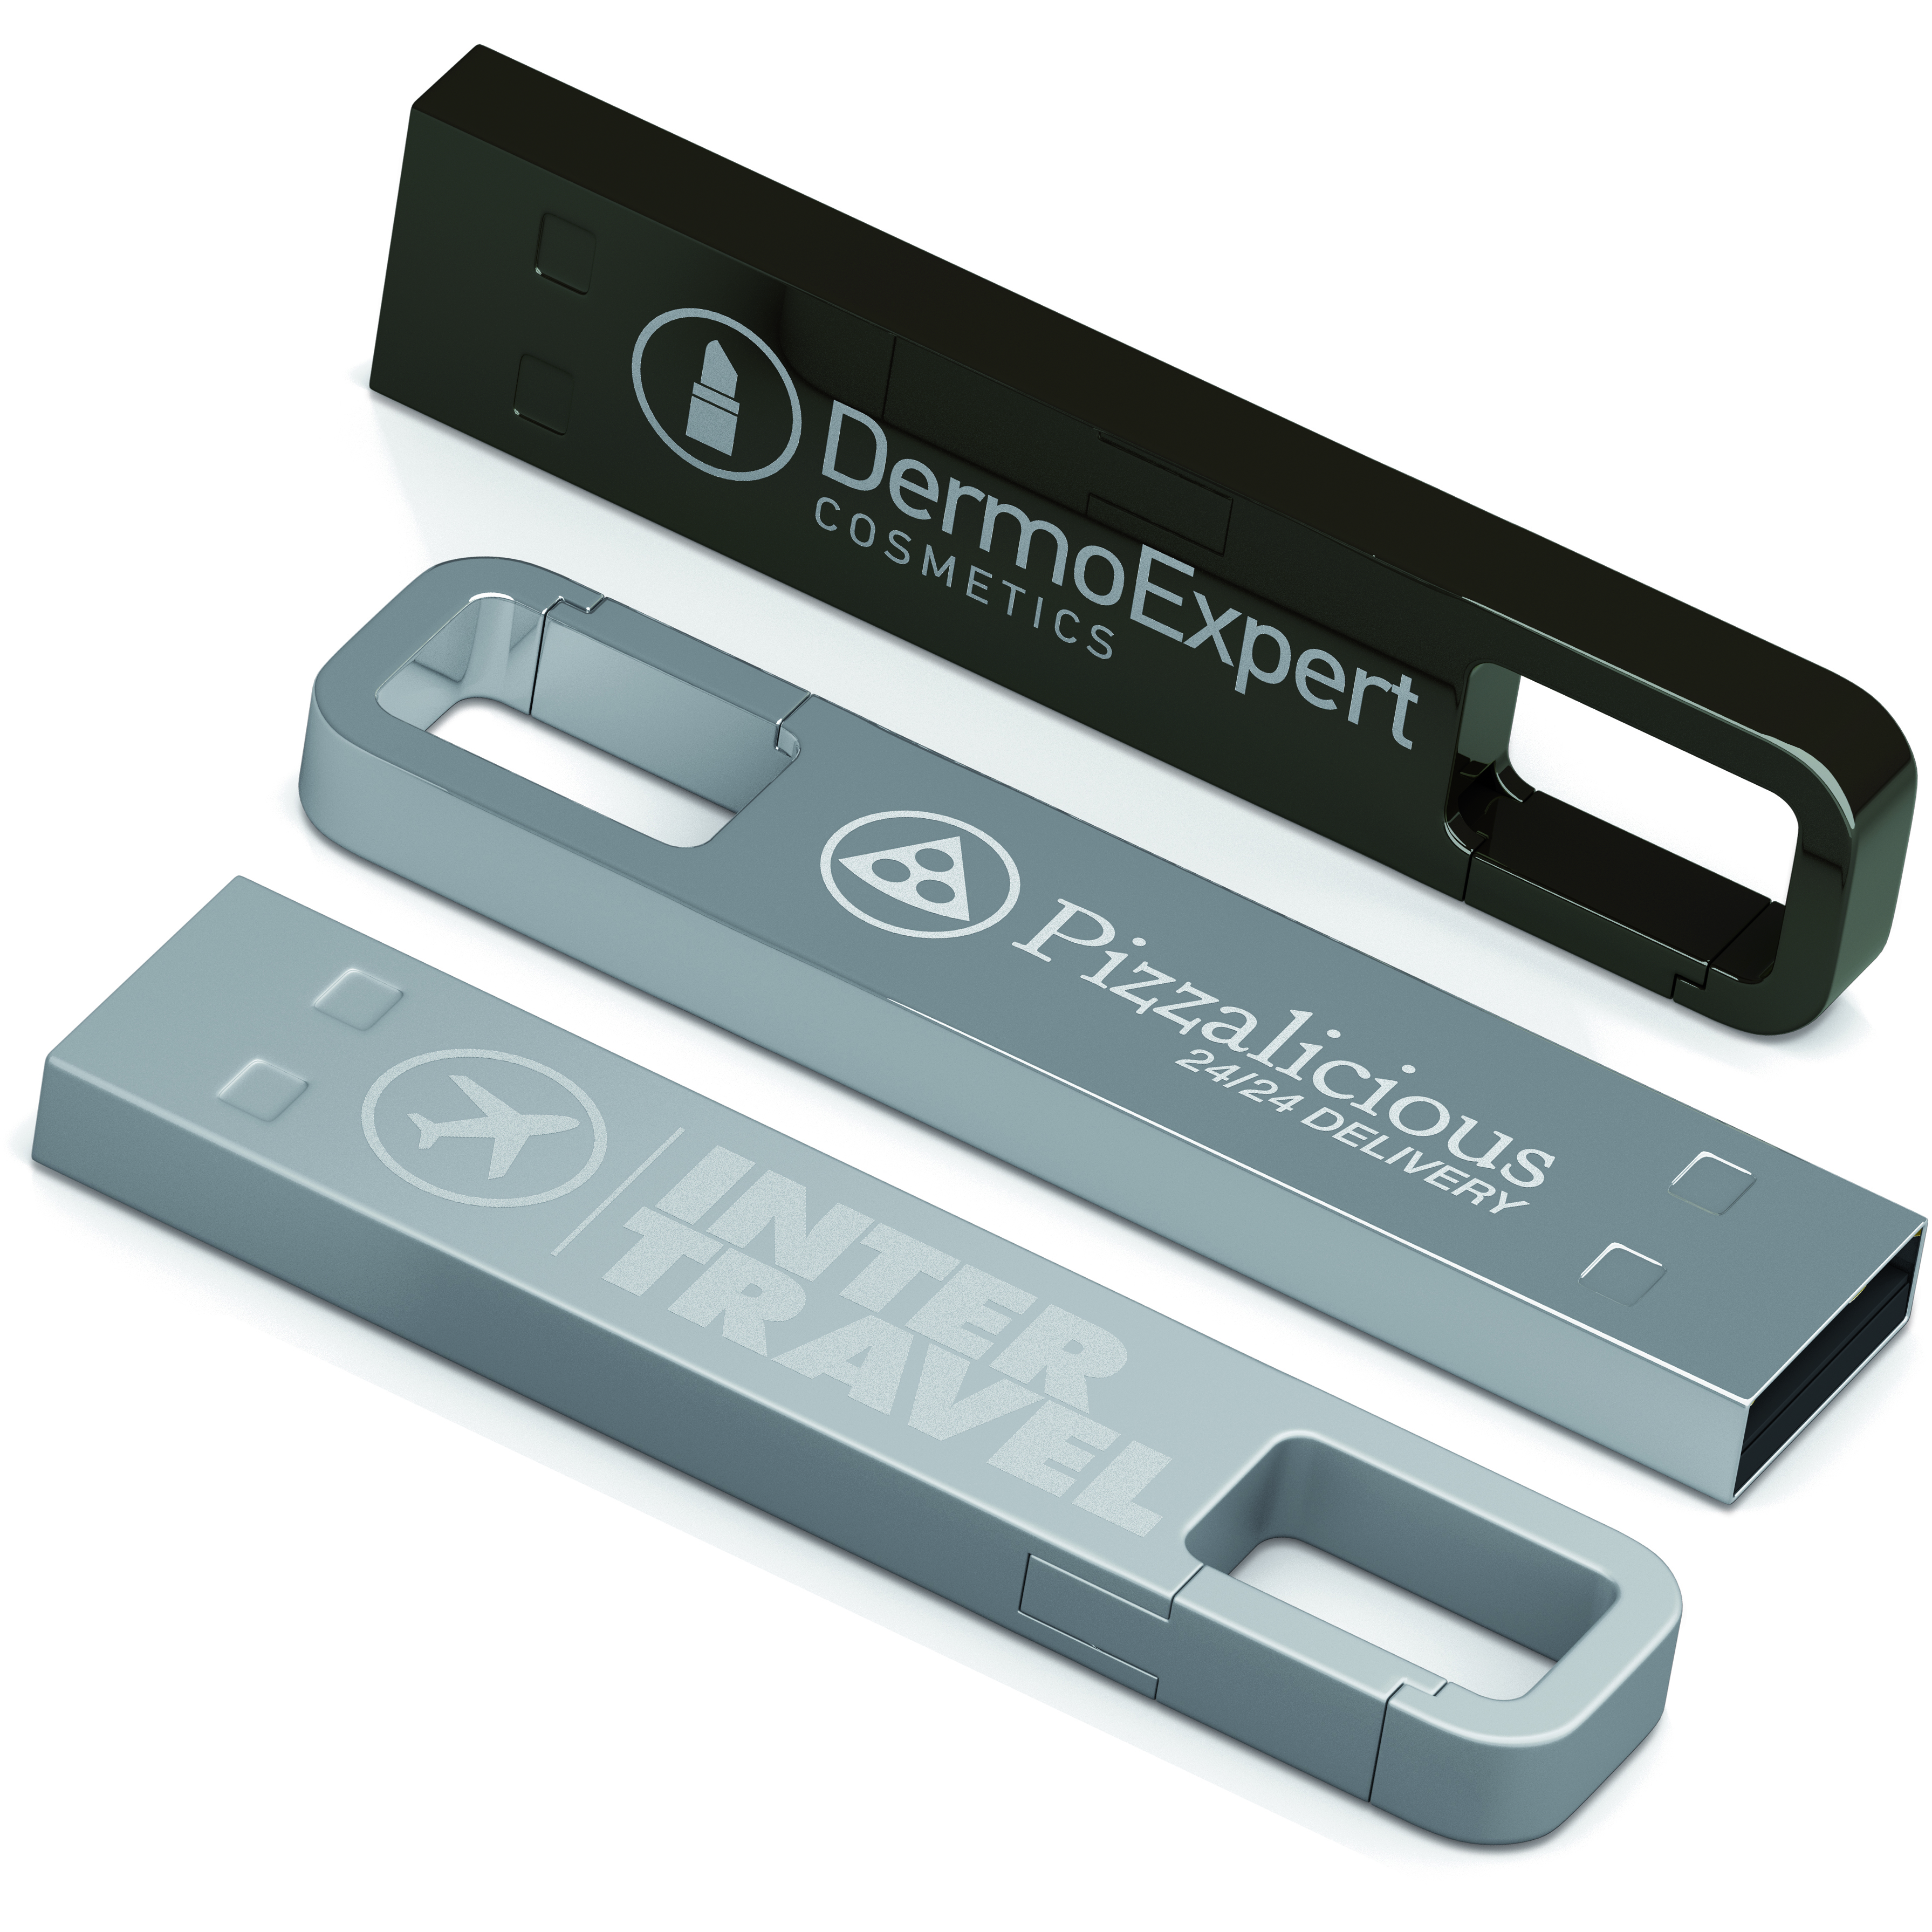 Logo USB Stick, USB Stick gravur, USB Stick bedruckt, Werbe USB Stick, Firmen USB Stick, USB Werbemittel